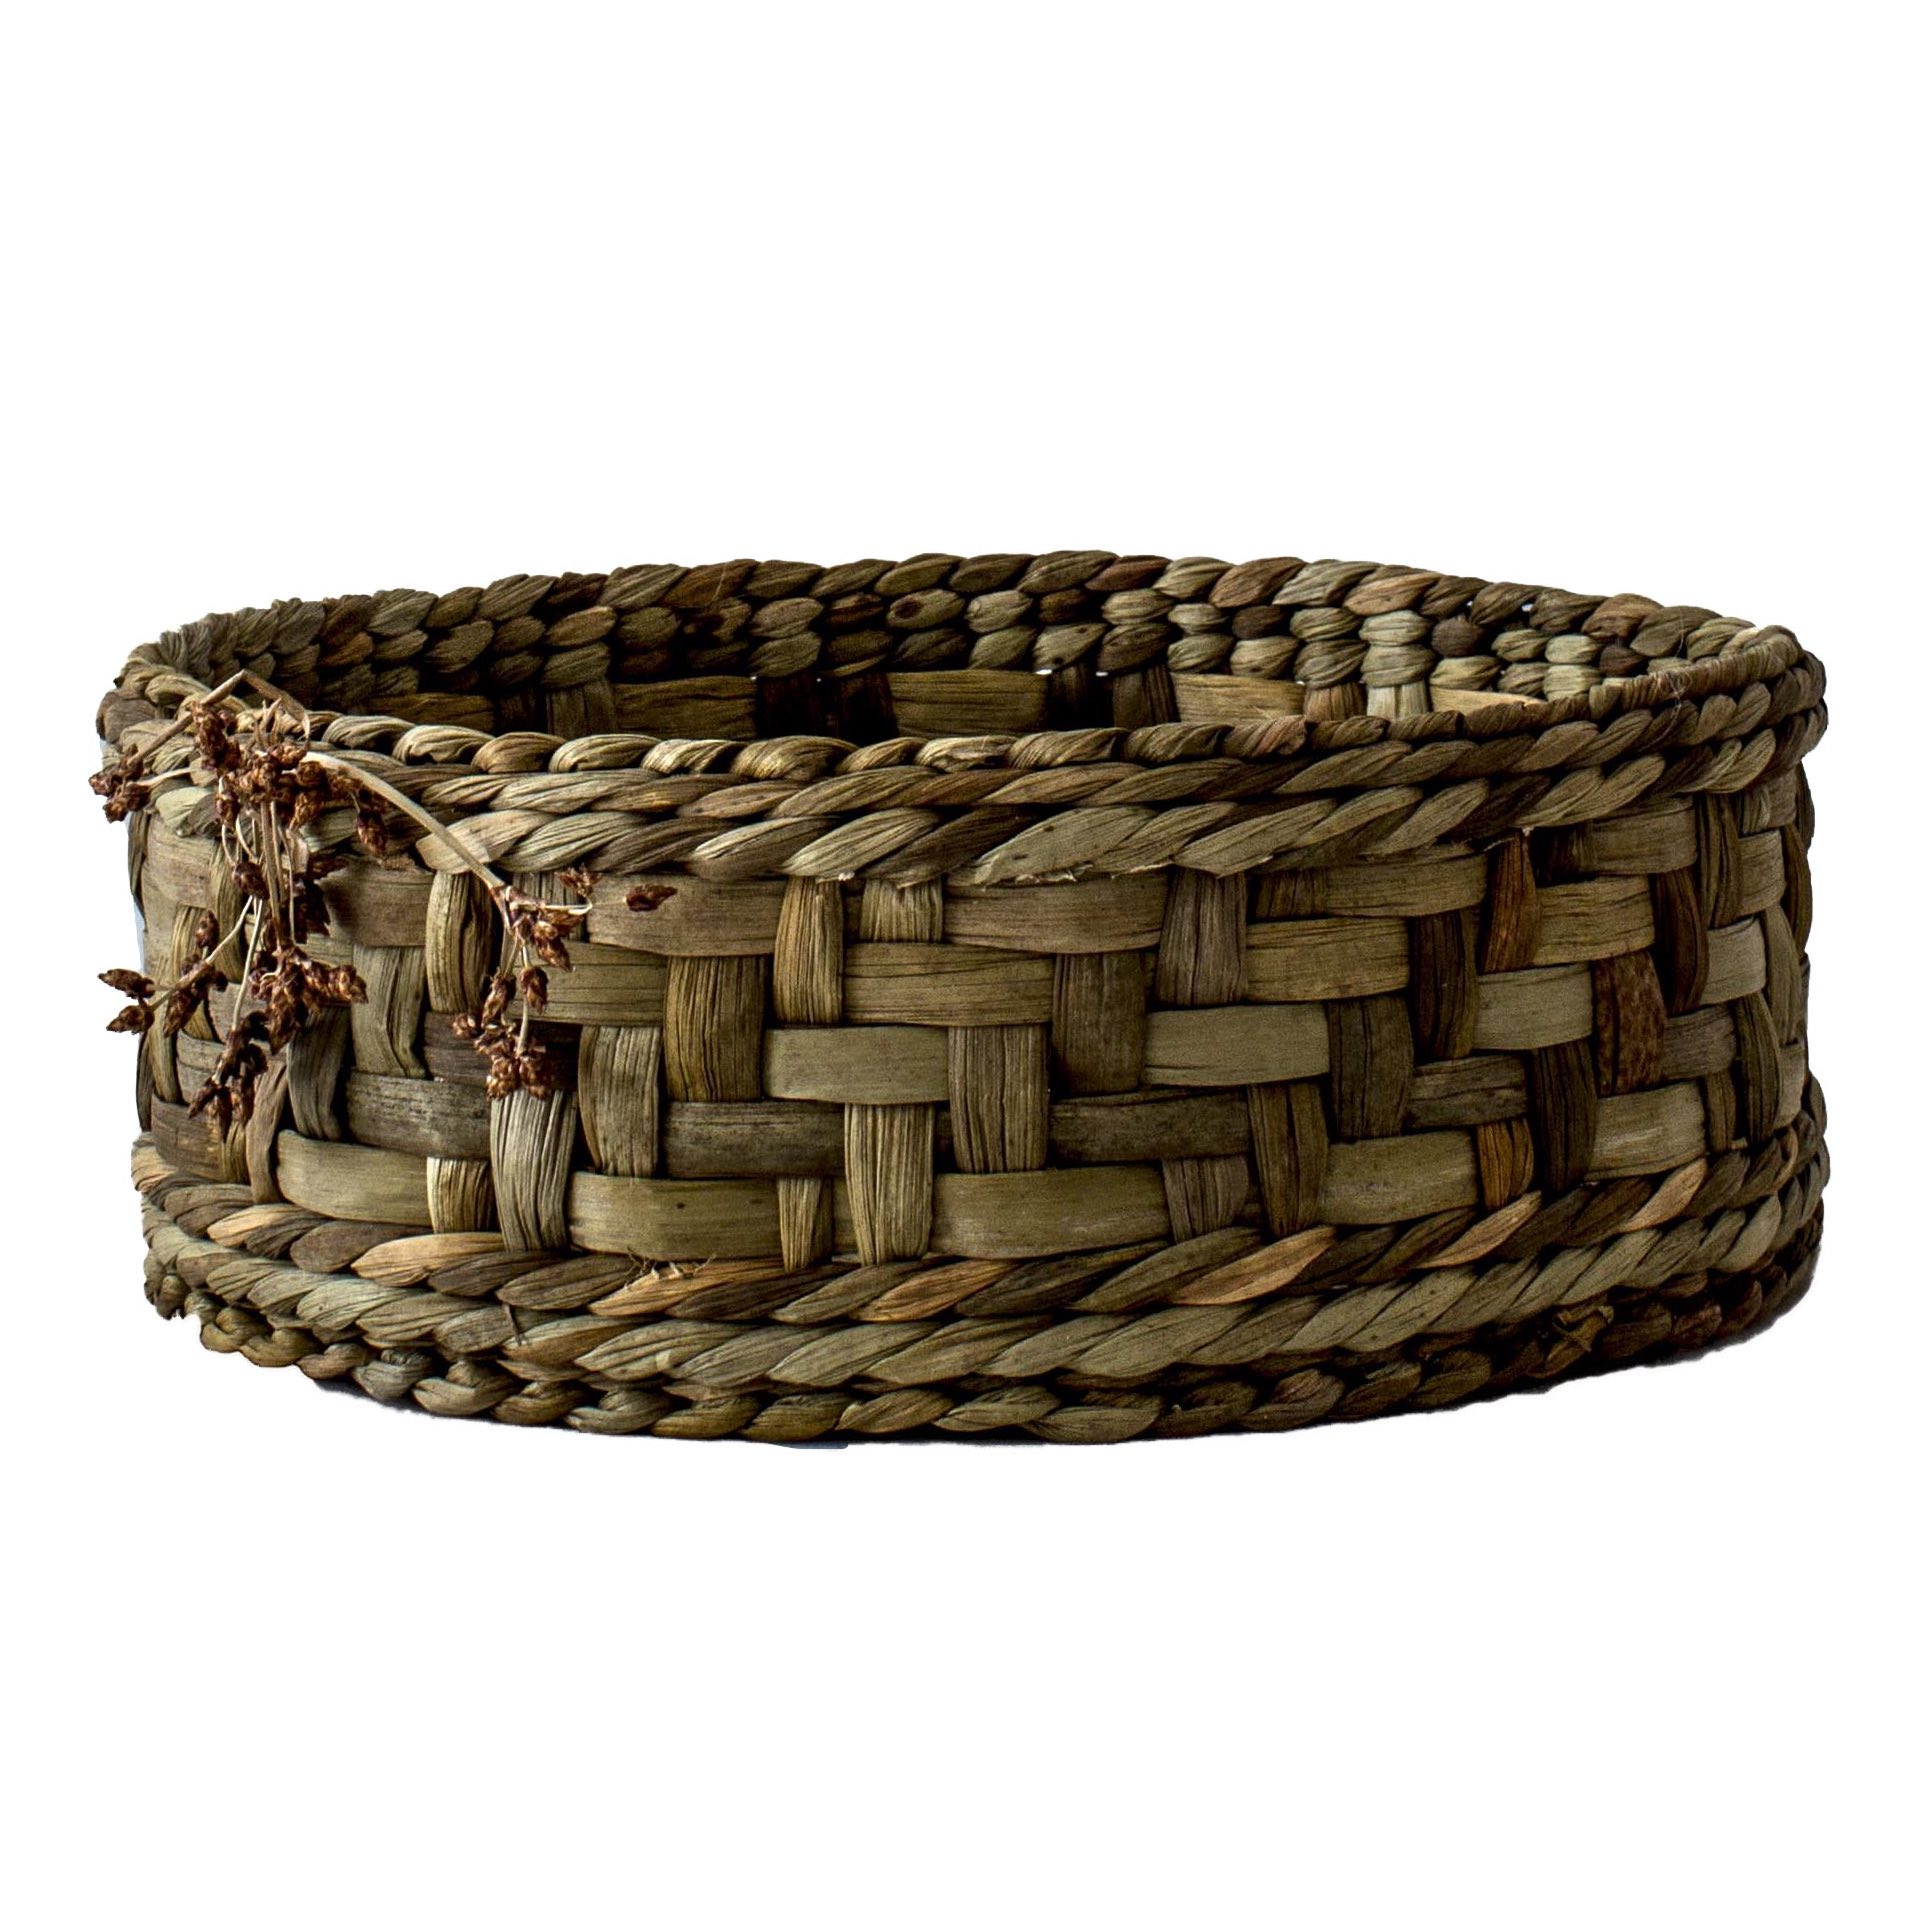 Bread Basket | Cut Out | Low Res